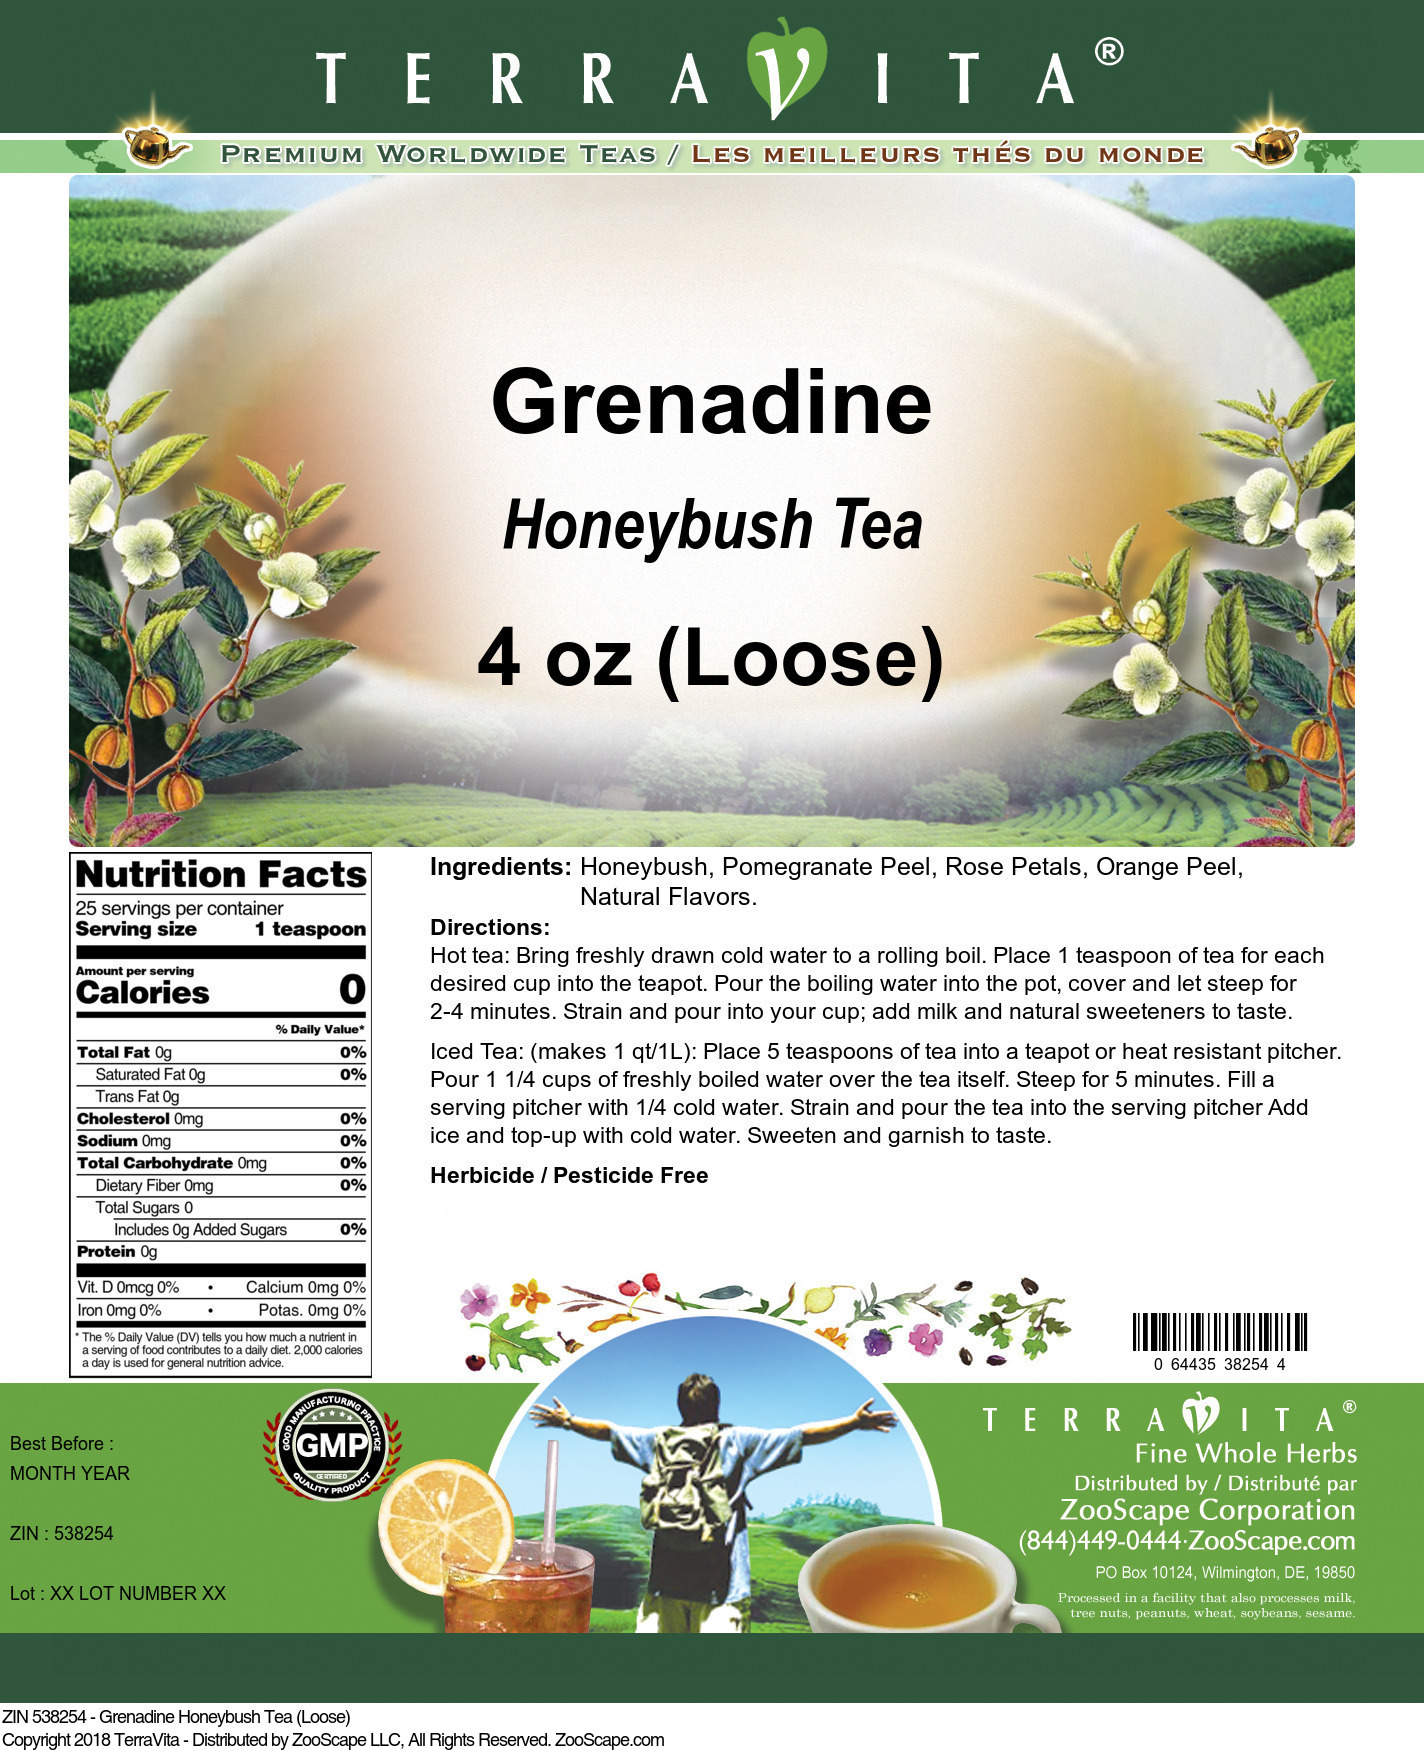 Grenadine Honeybush Tea (Loose)